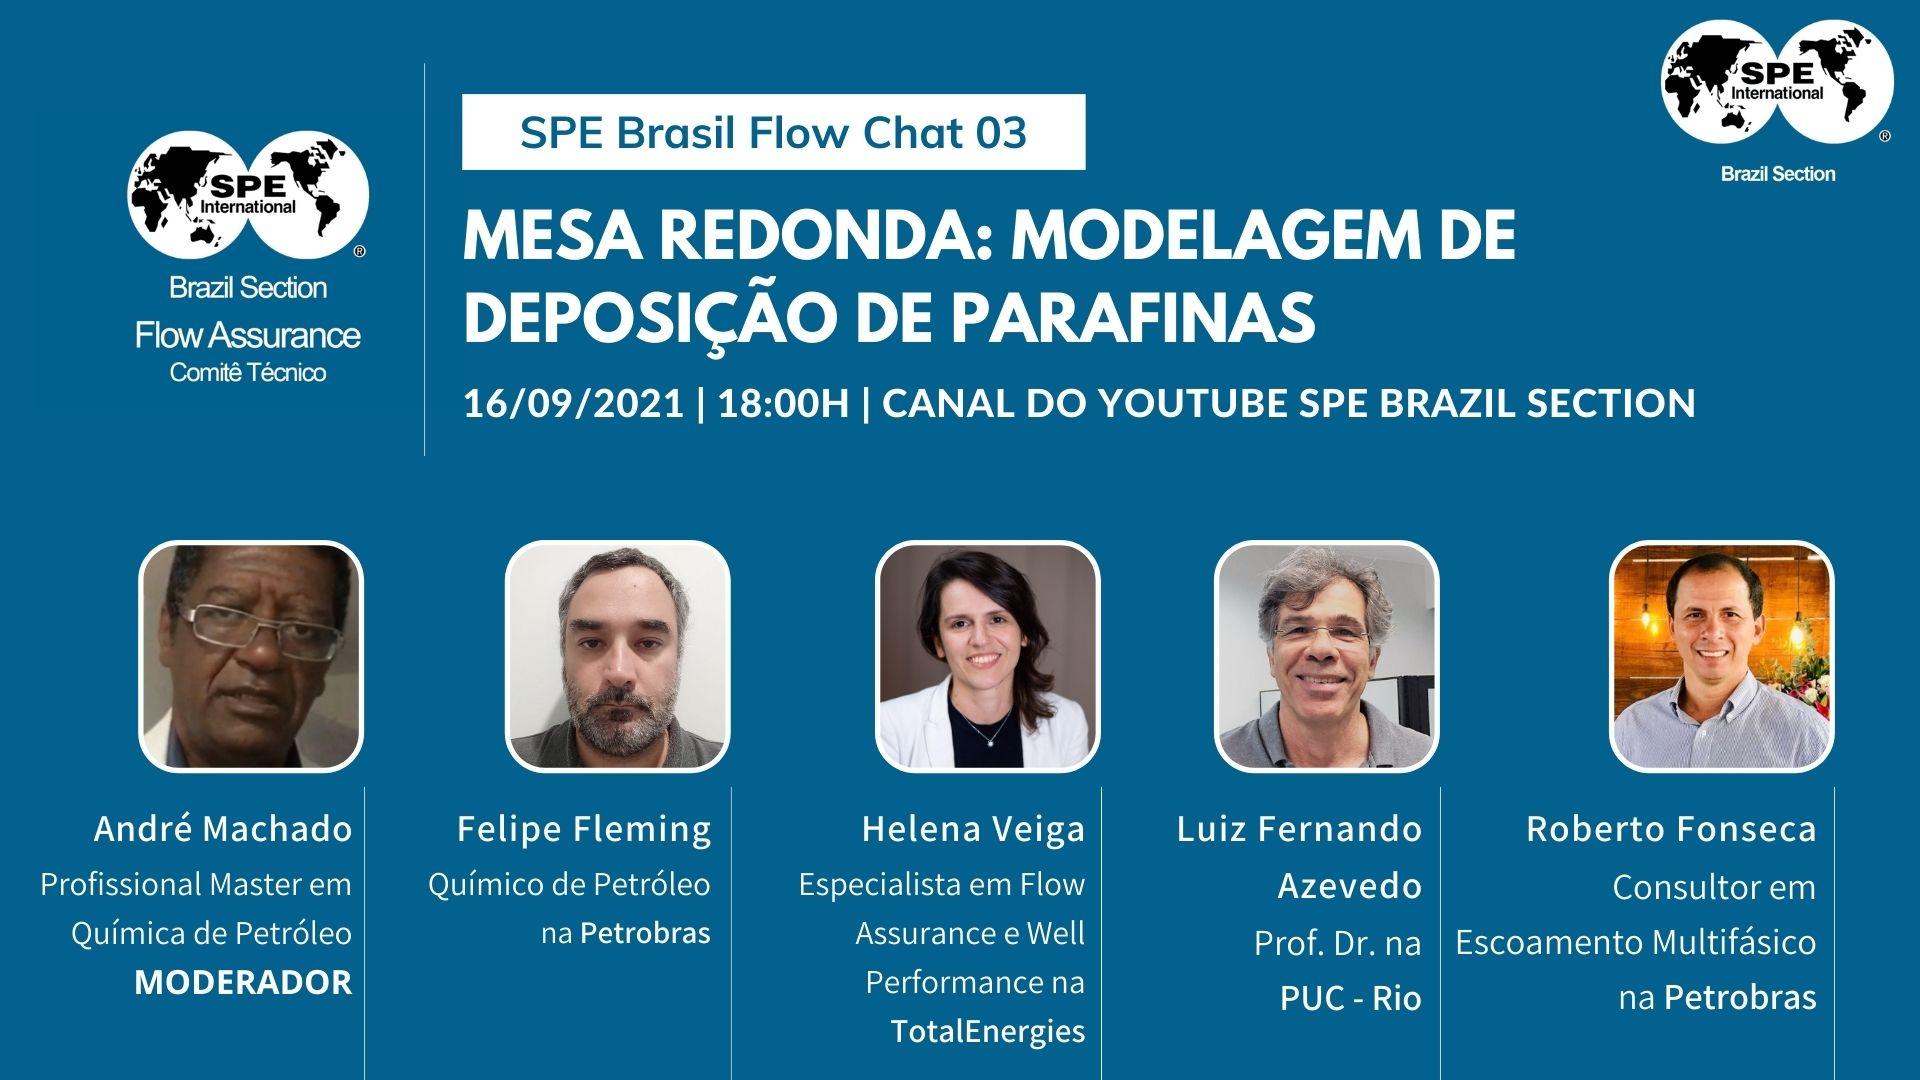 SPE Brasil Flow Chat 03